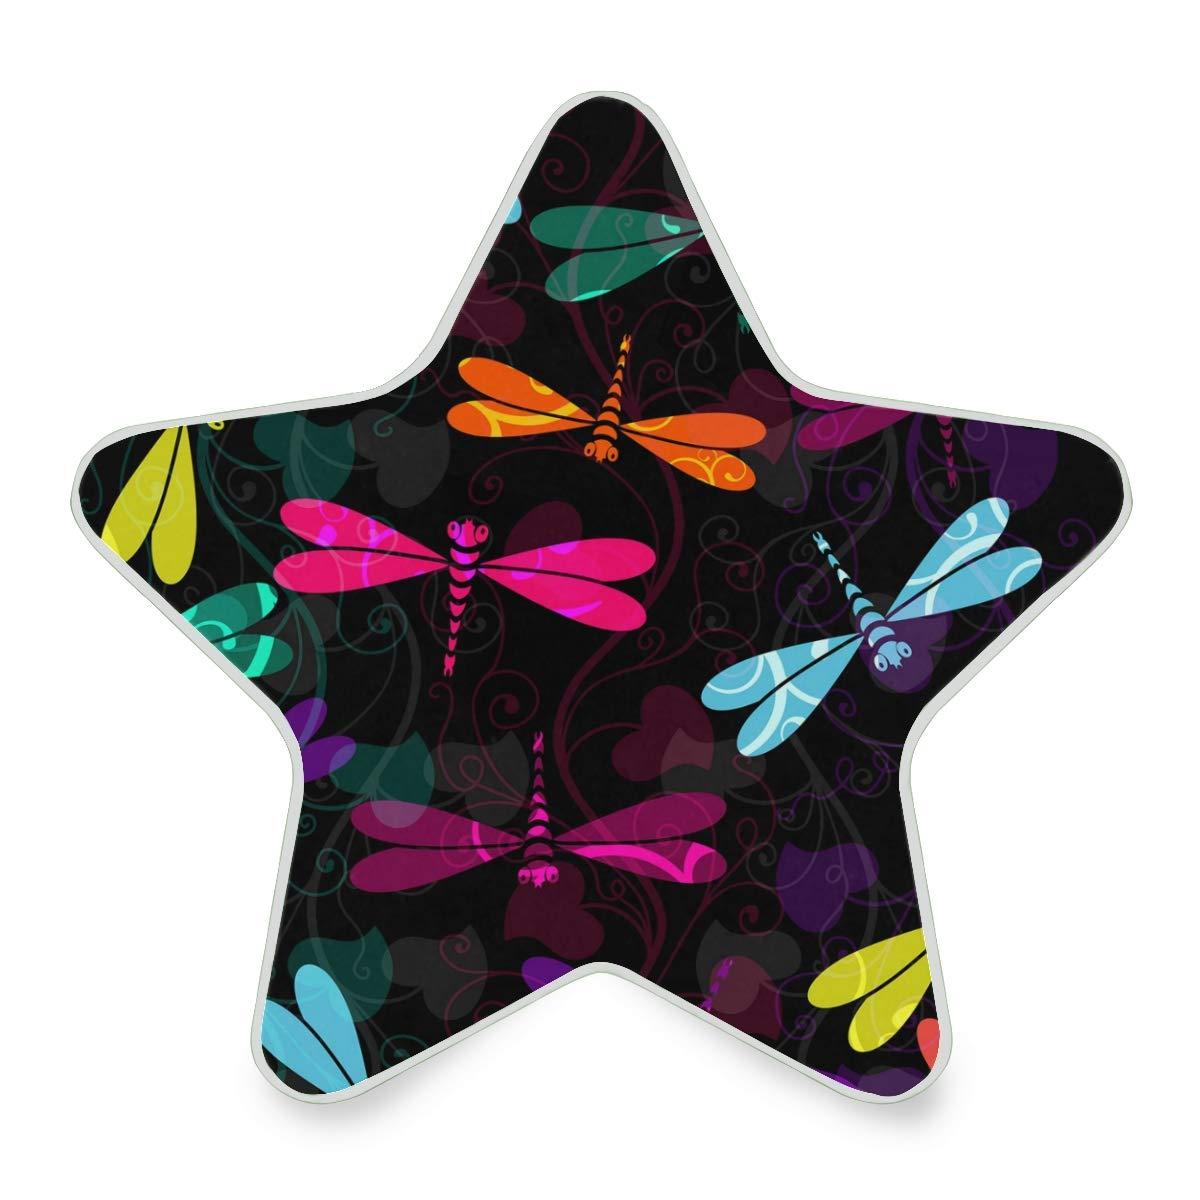 Mini Night Light Damask Flower Dragonfly Special Star Pentagram Shaped Nightlight Children's Bedroom Cute Plug in Light Decoration Emergency Lamp for Kids Girls Boys Childrens